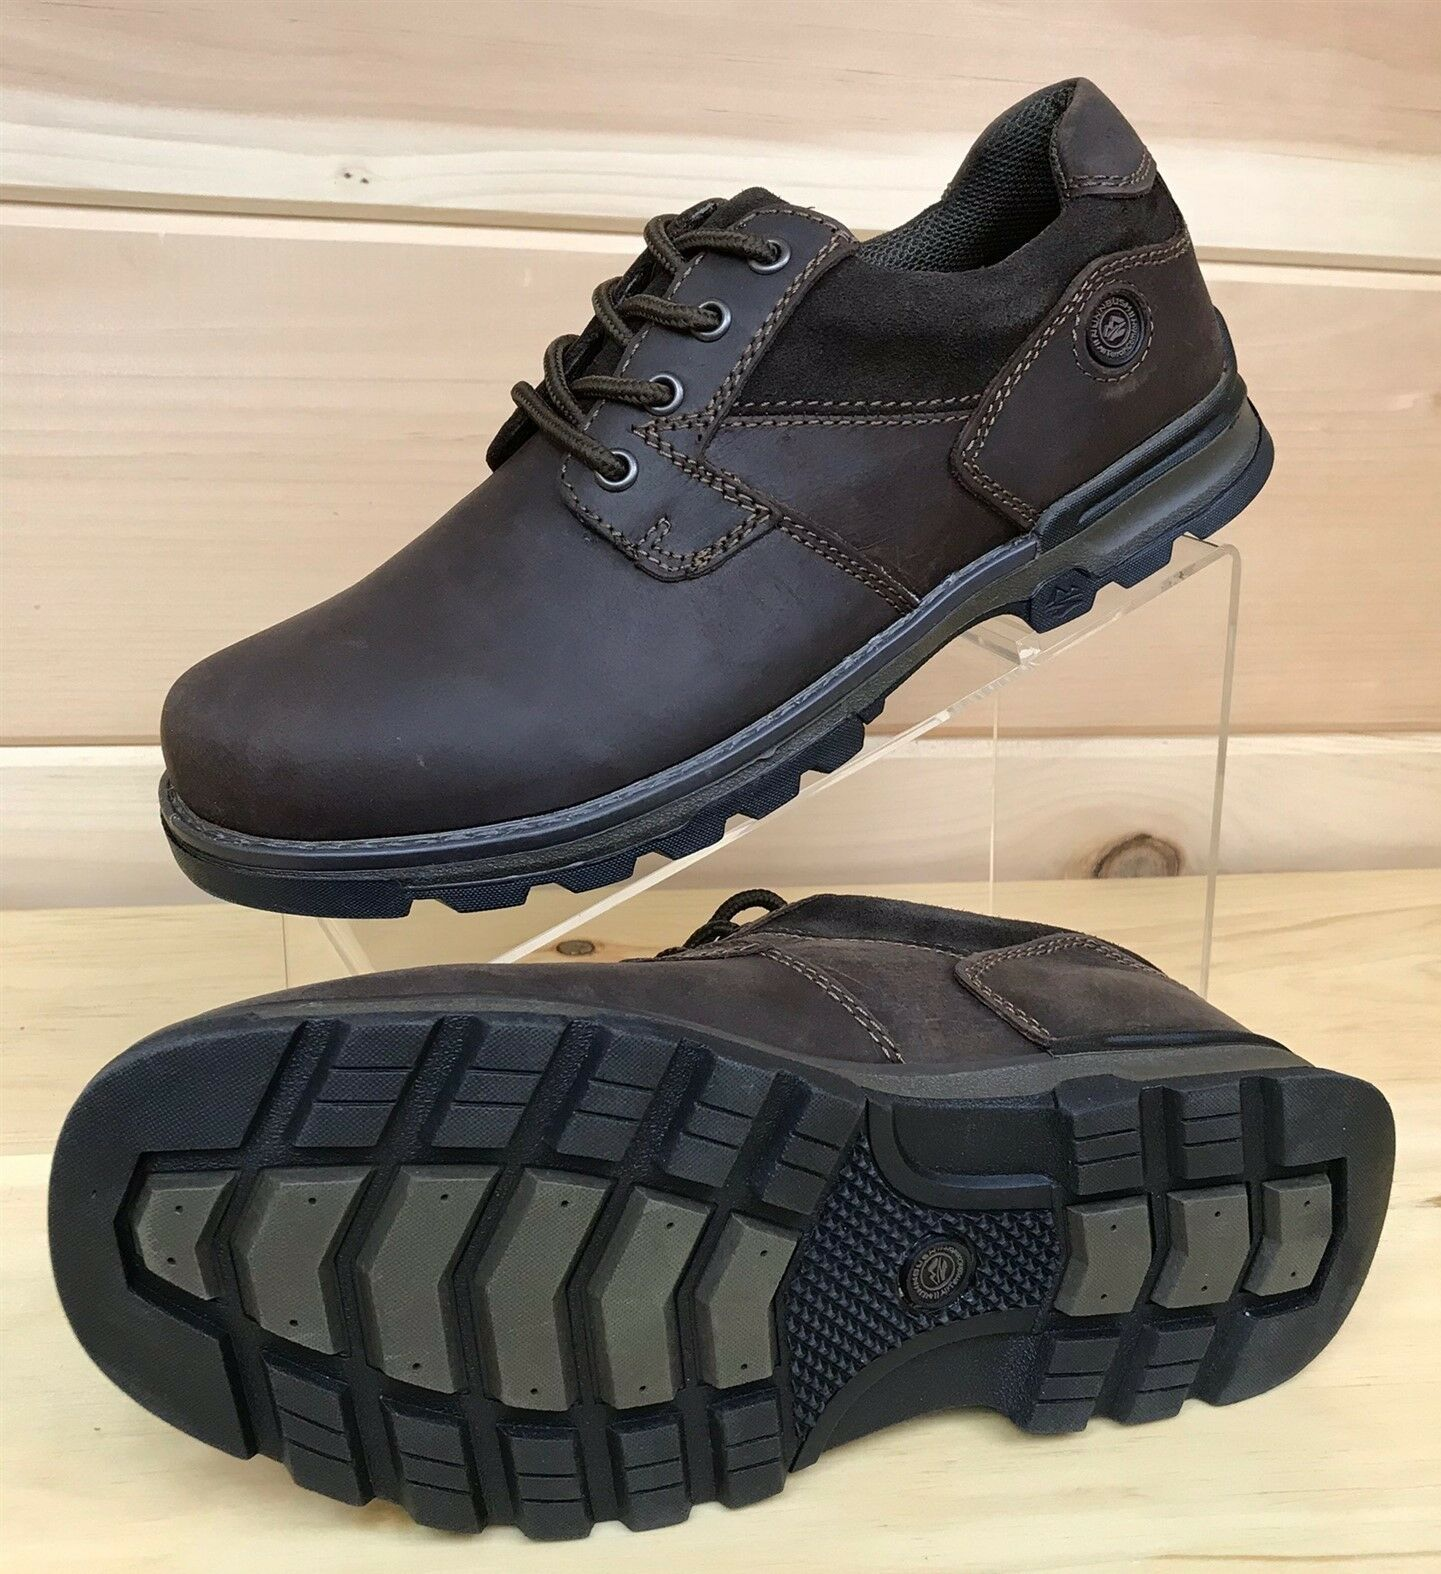 Nunn Bush Size 8 M Phillips Oxford Brown Pelle Work Shoe 84671-200